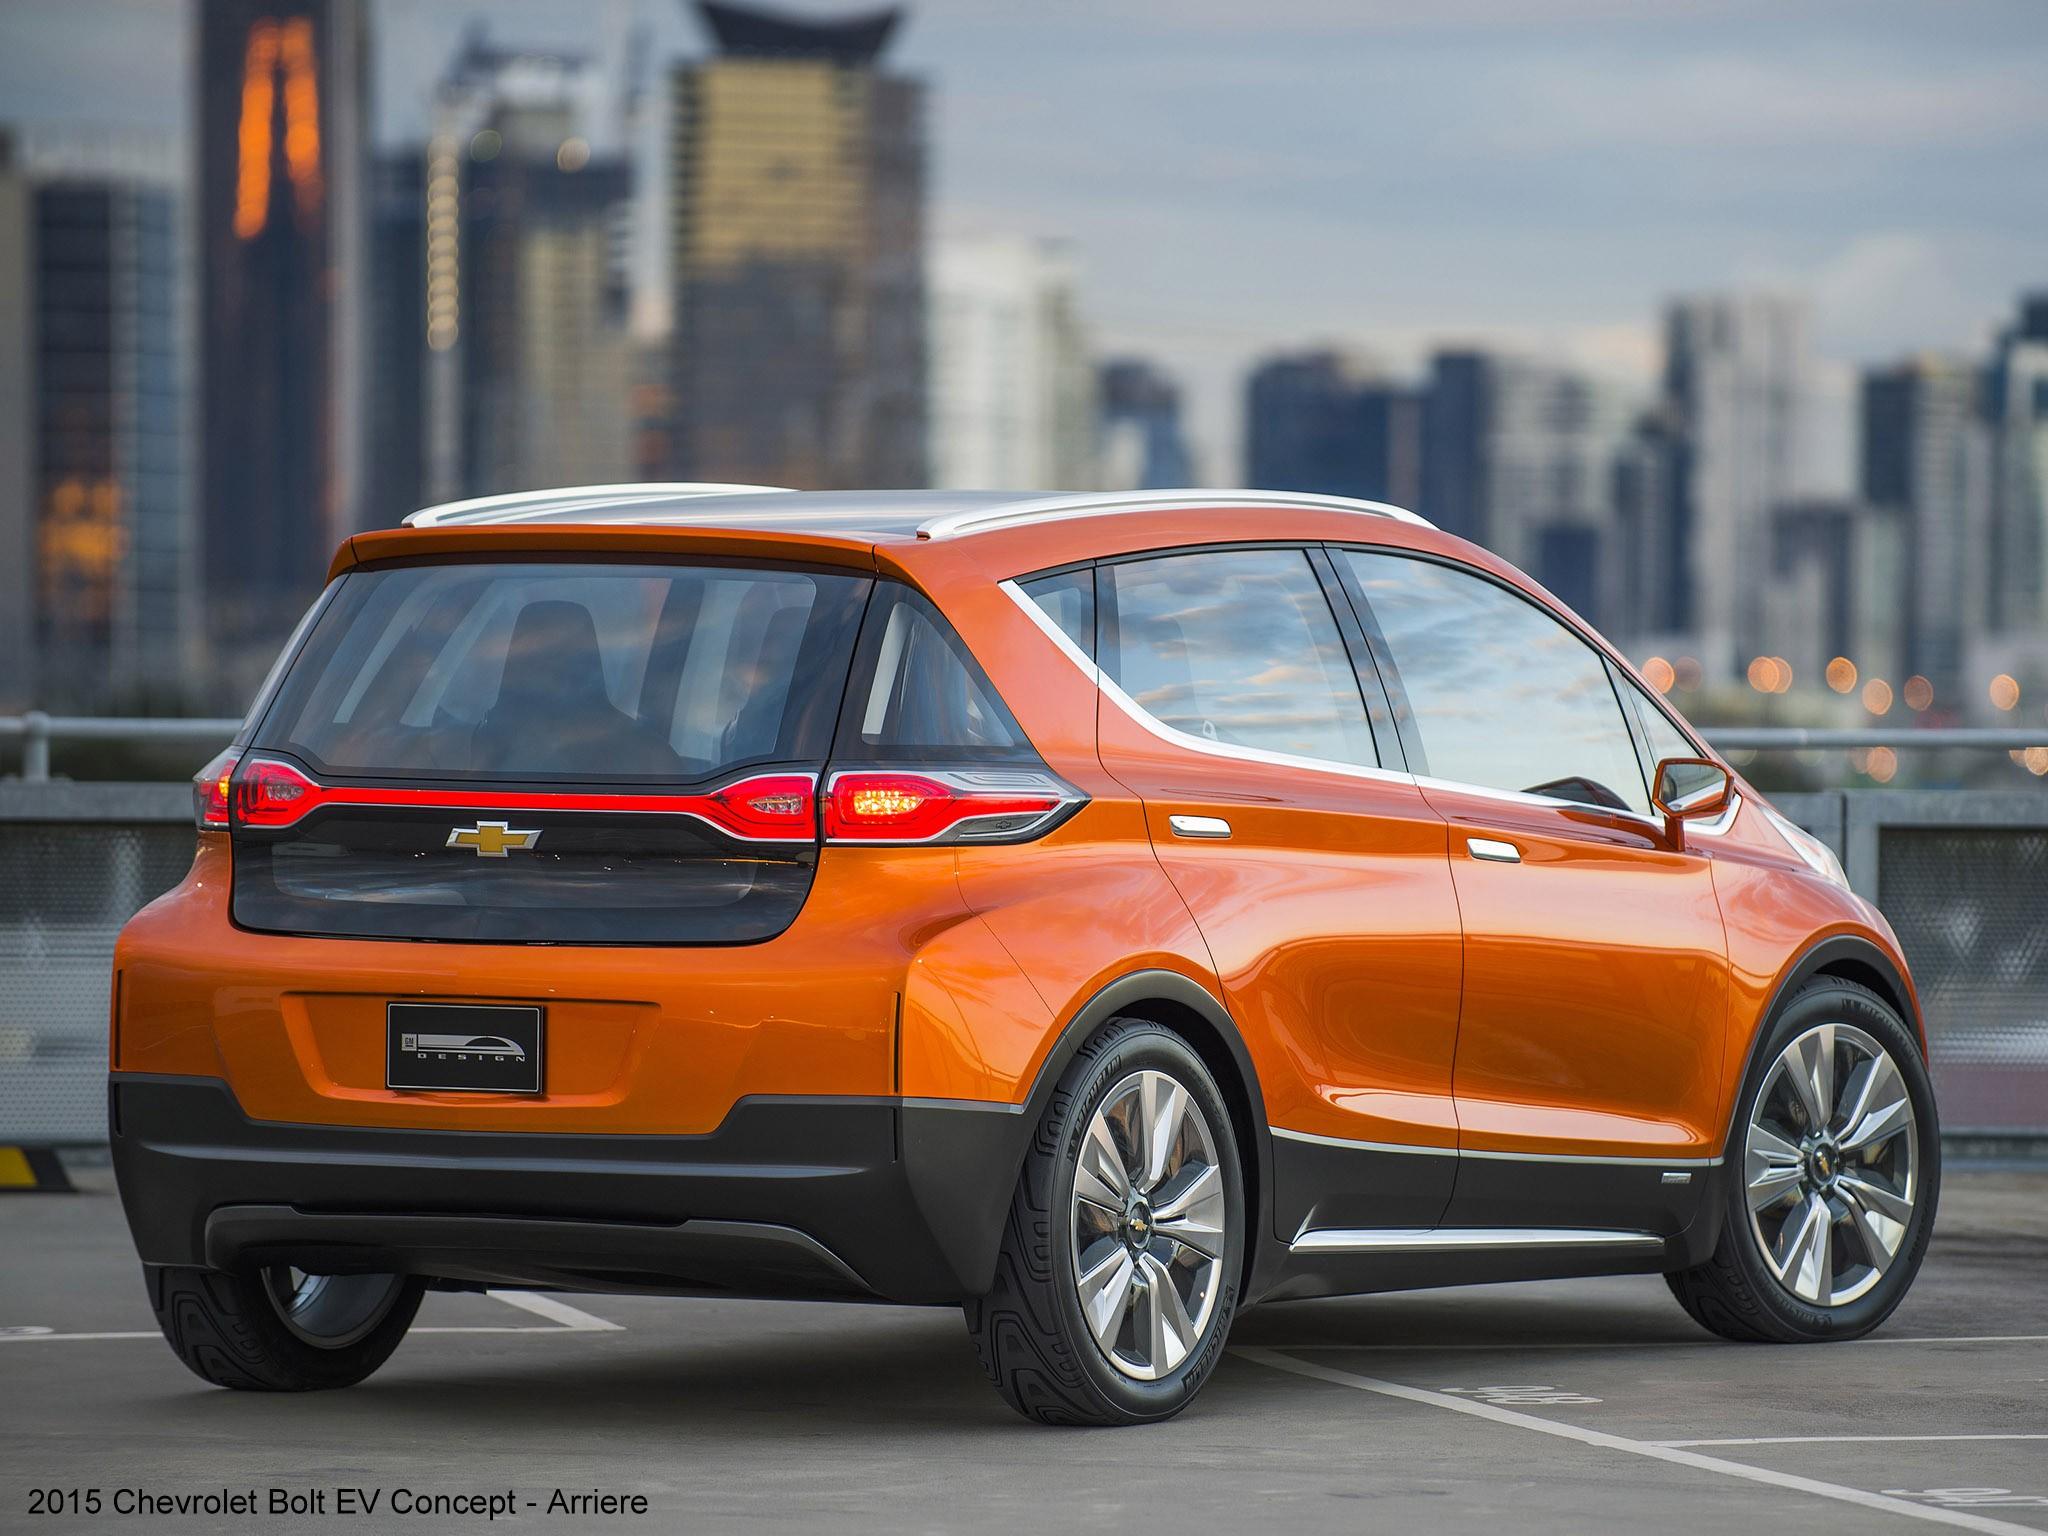 2015 Chevrolet Bolt EV Concept